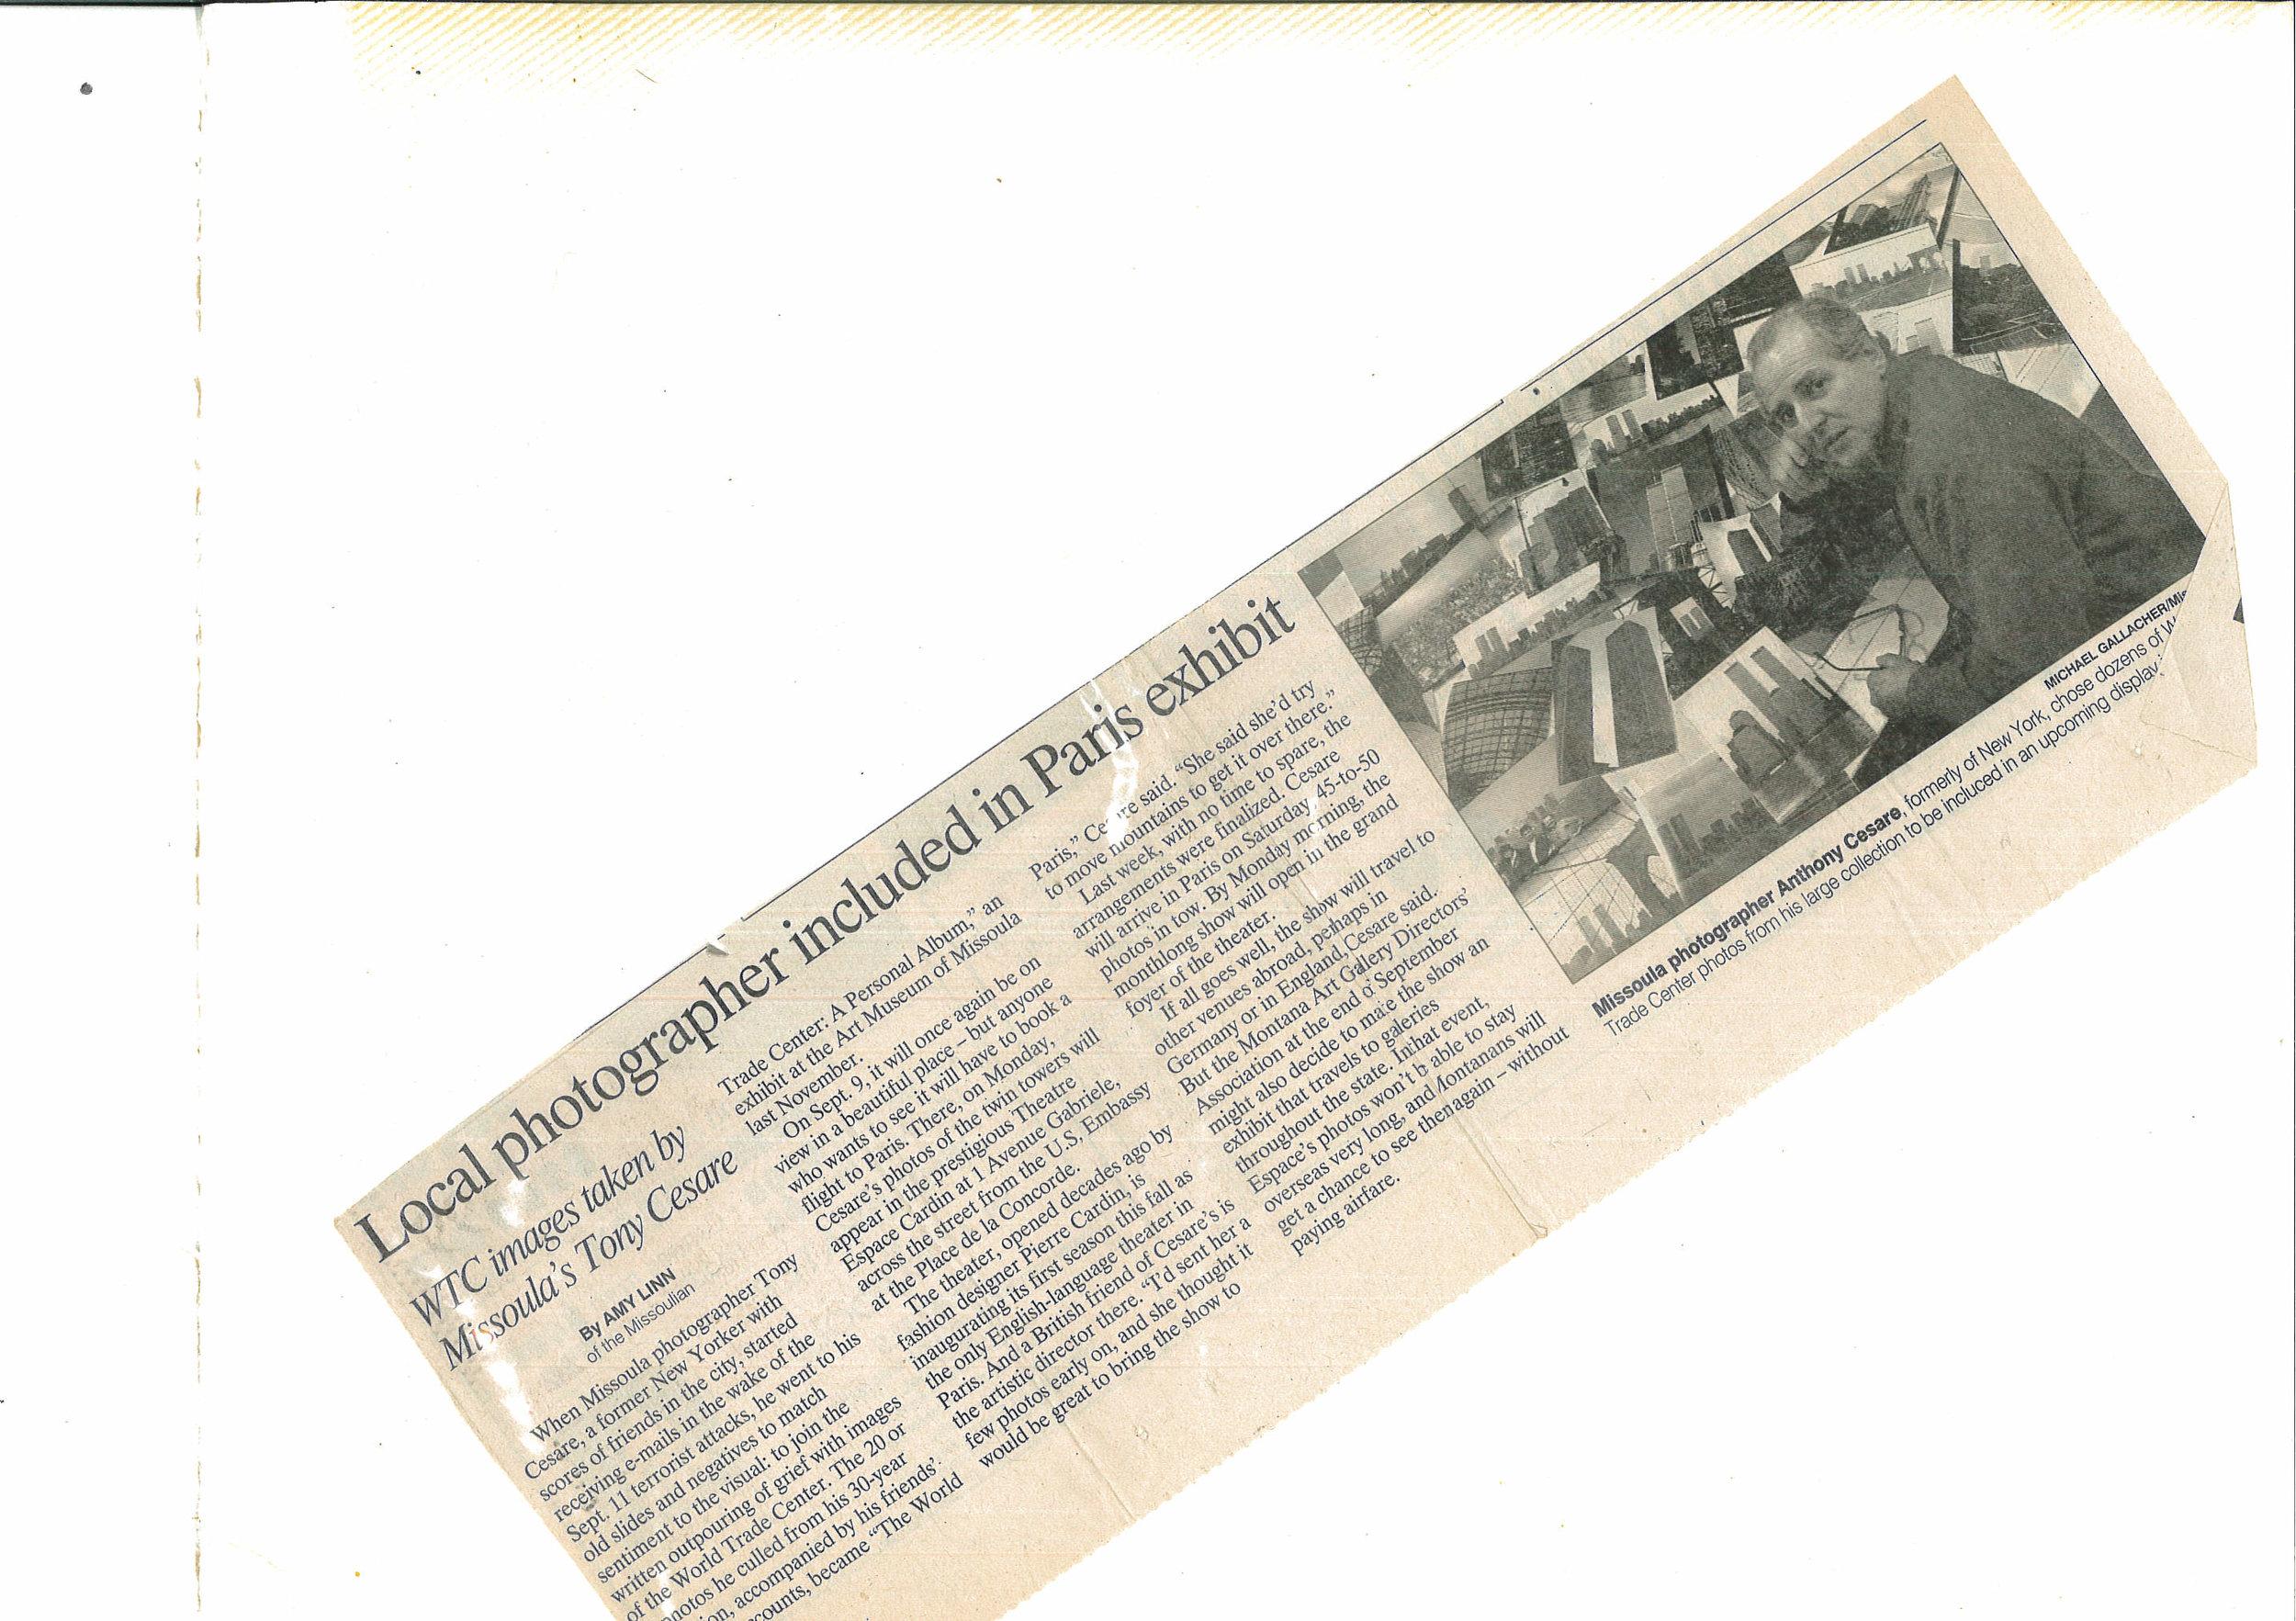 OWAP review WTC photo exhibit by tony espace cardin.jpg